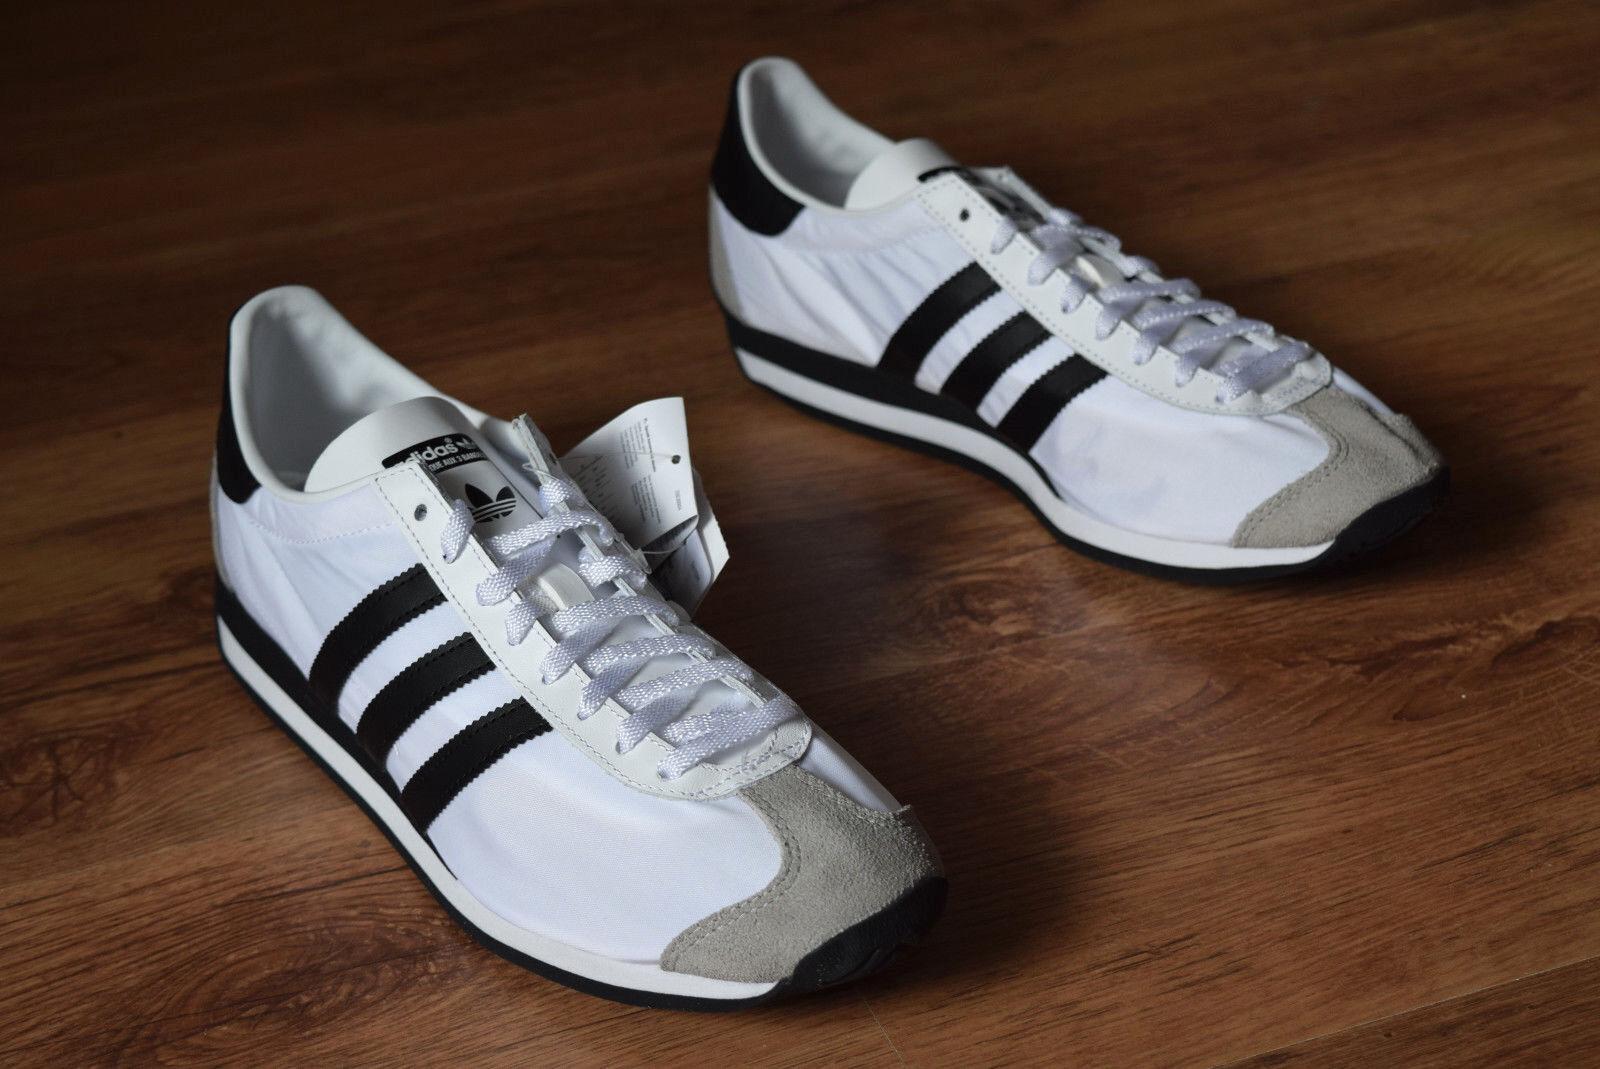 Adidas Country OG 41 44,5 47 inki 48,5 S79106 70er Vintage inki 47 SL la trAineR rom b5a890